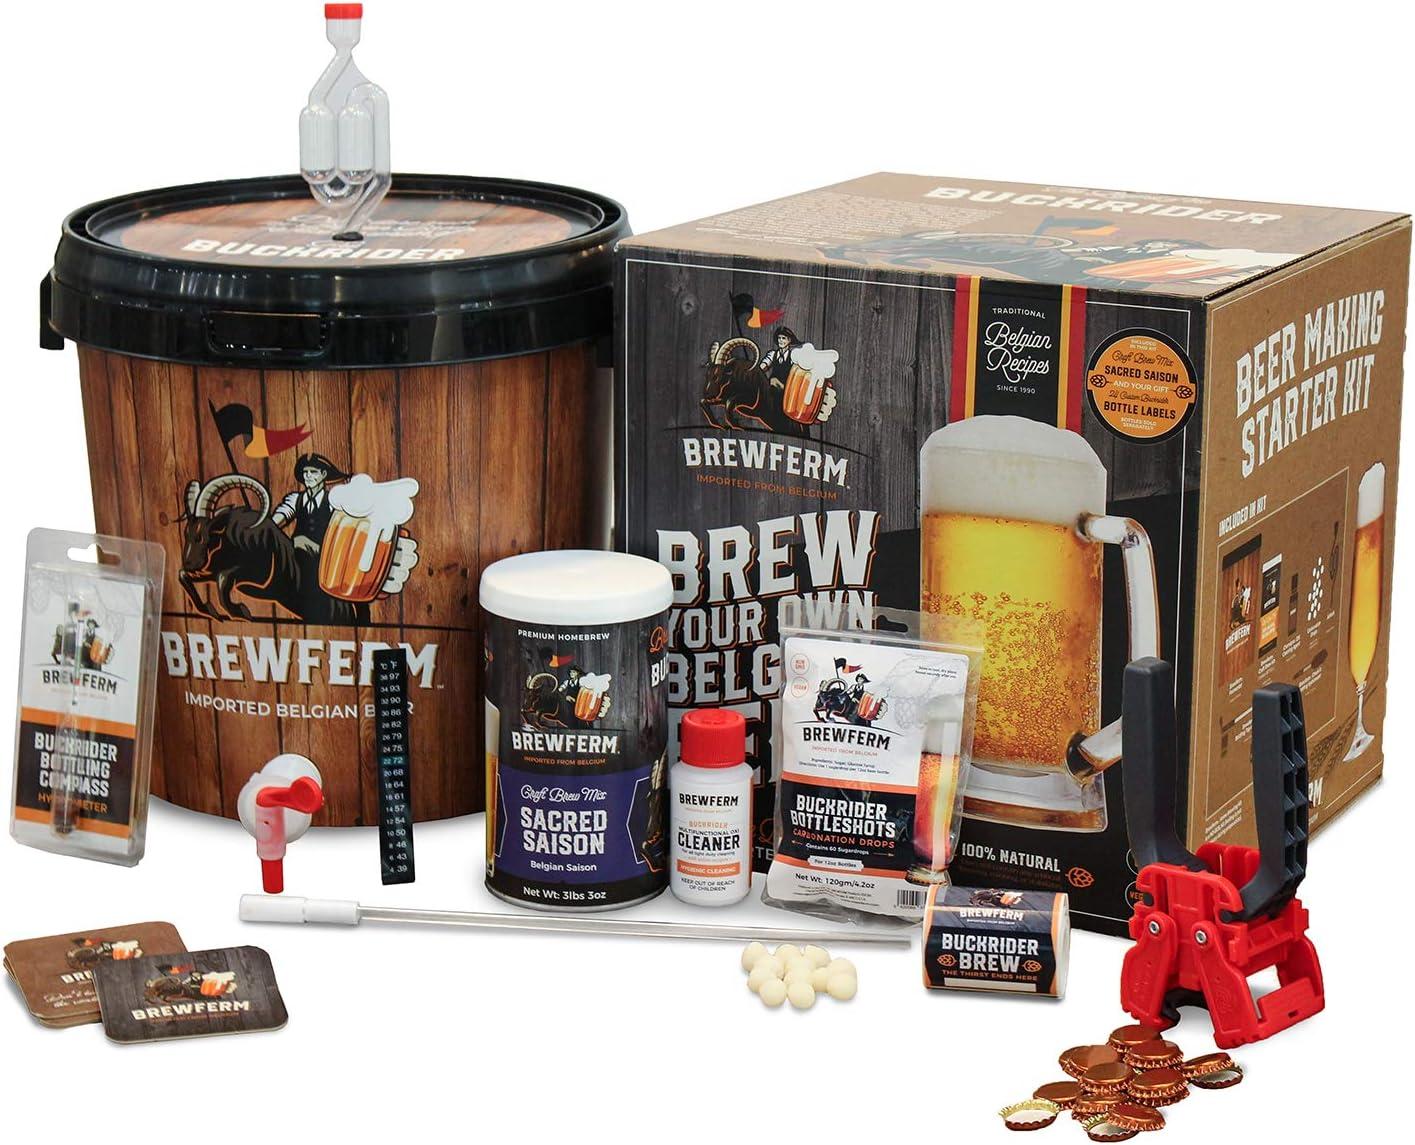 Brewferm Buckrider Belgian Homebrewing Premium Deluxe Brew Kit - Sacred Saison Premium Deluxe Craft Brew Mix - No Boil - Makes 15 Liters/ 4 gallons